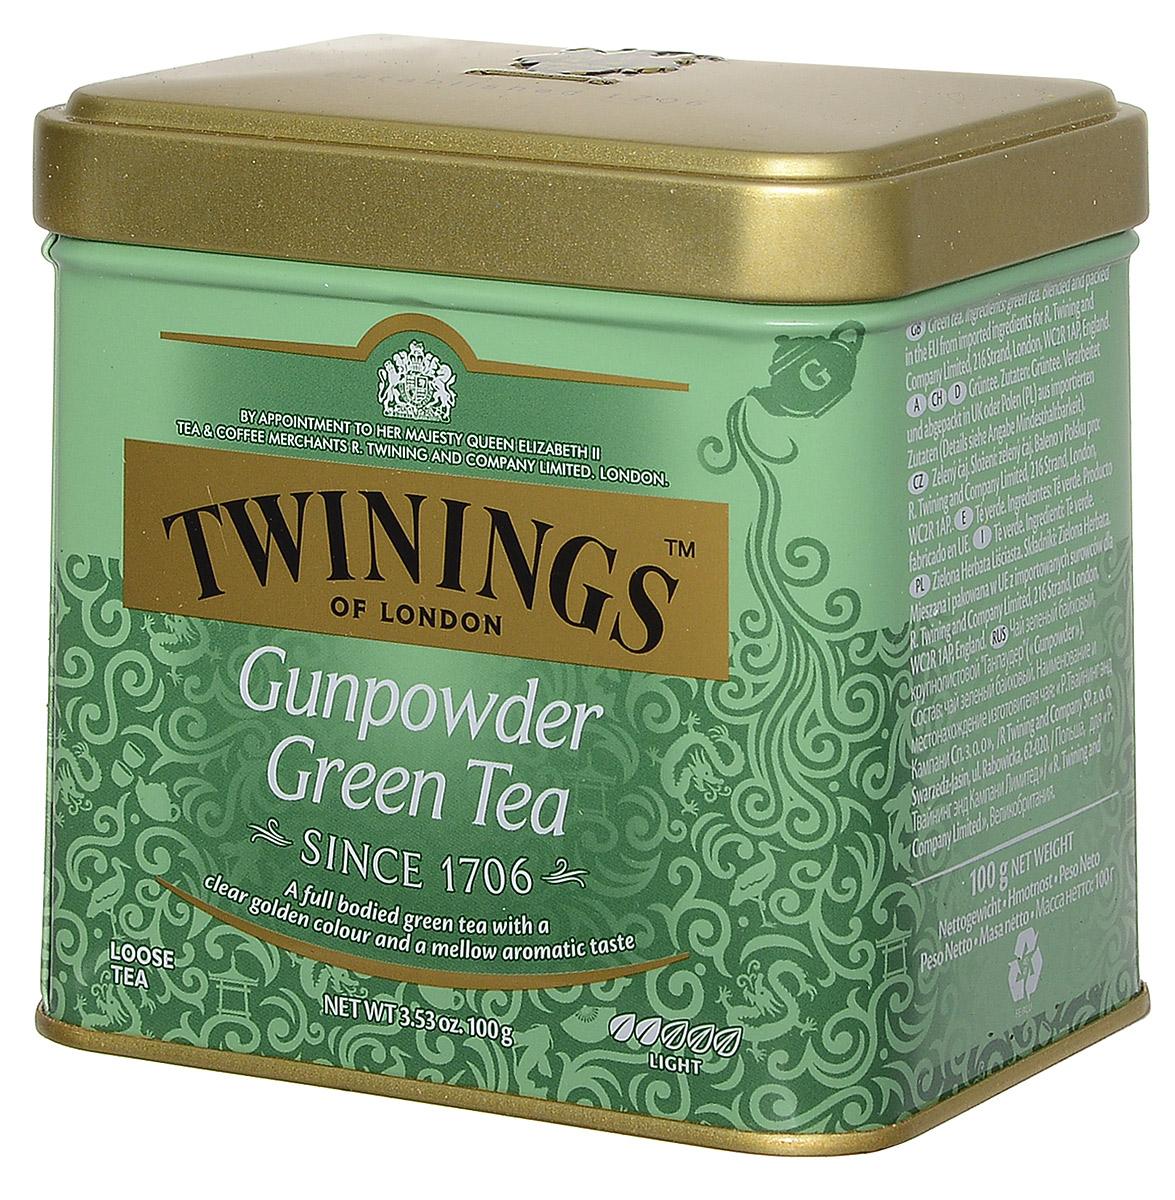 Twinings Gunpowder Green зеленый листовой чай, 100 г (ж/б) newby hi chung зеленый листовой чай 125 г